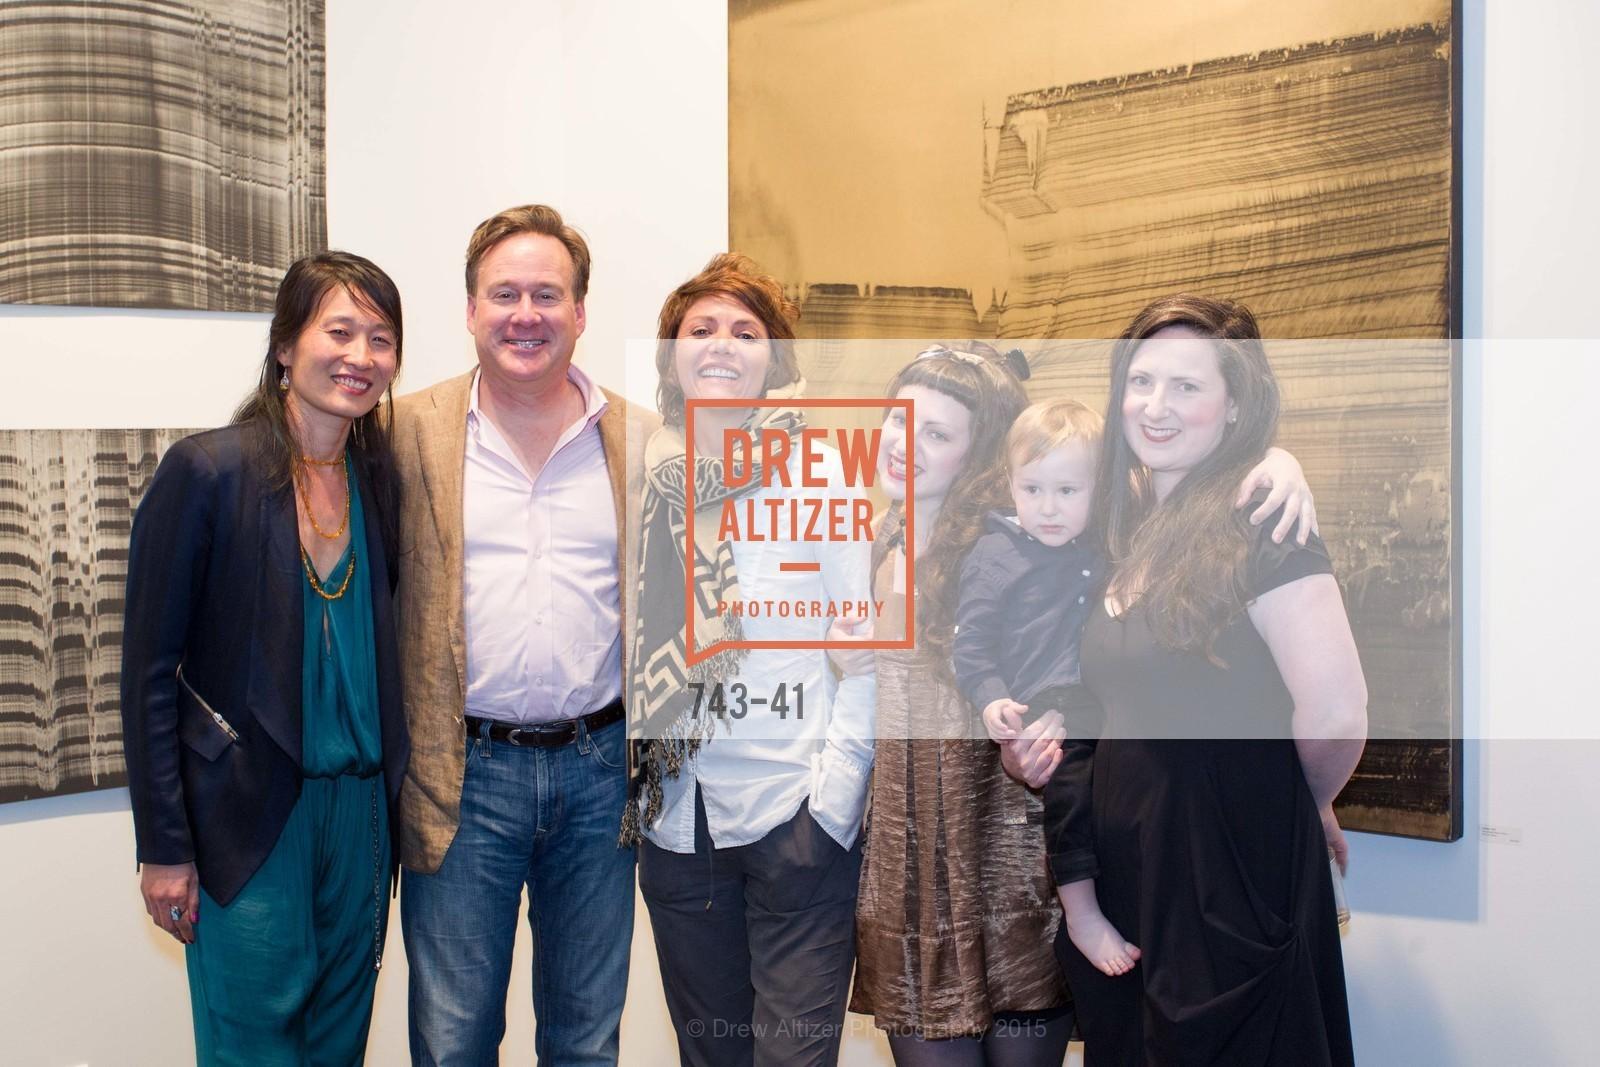 Sung Lee, David Donn, Miriam Cabessa, Jilian Monribot, Janel Dryan, Projex Connect presents